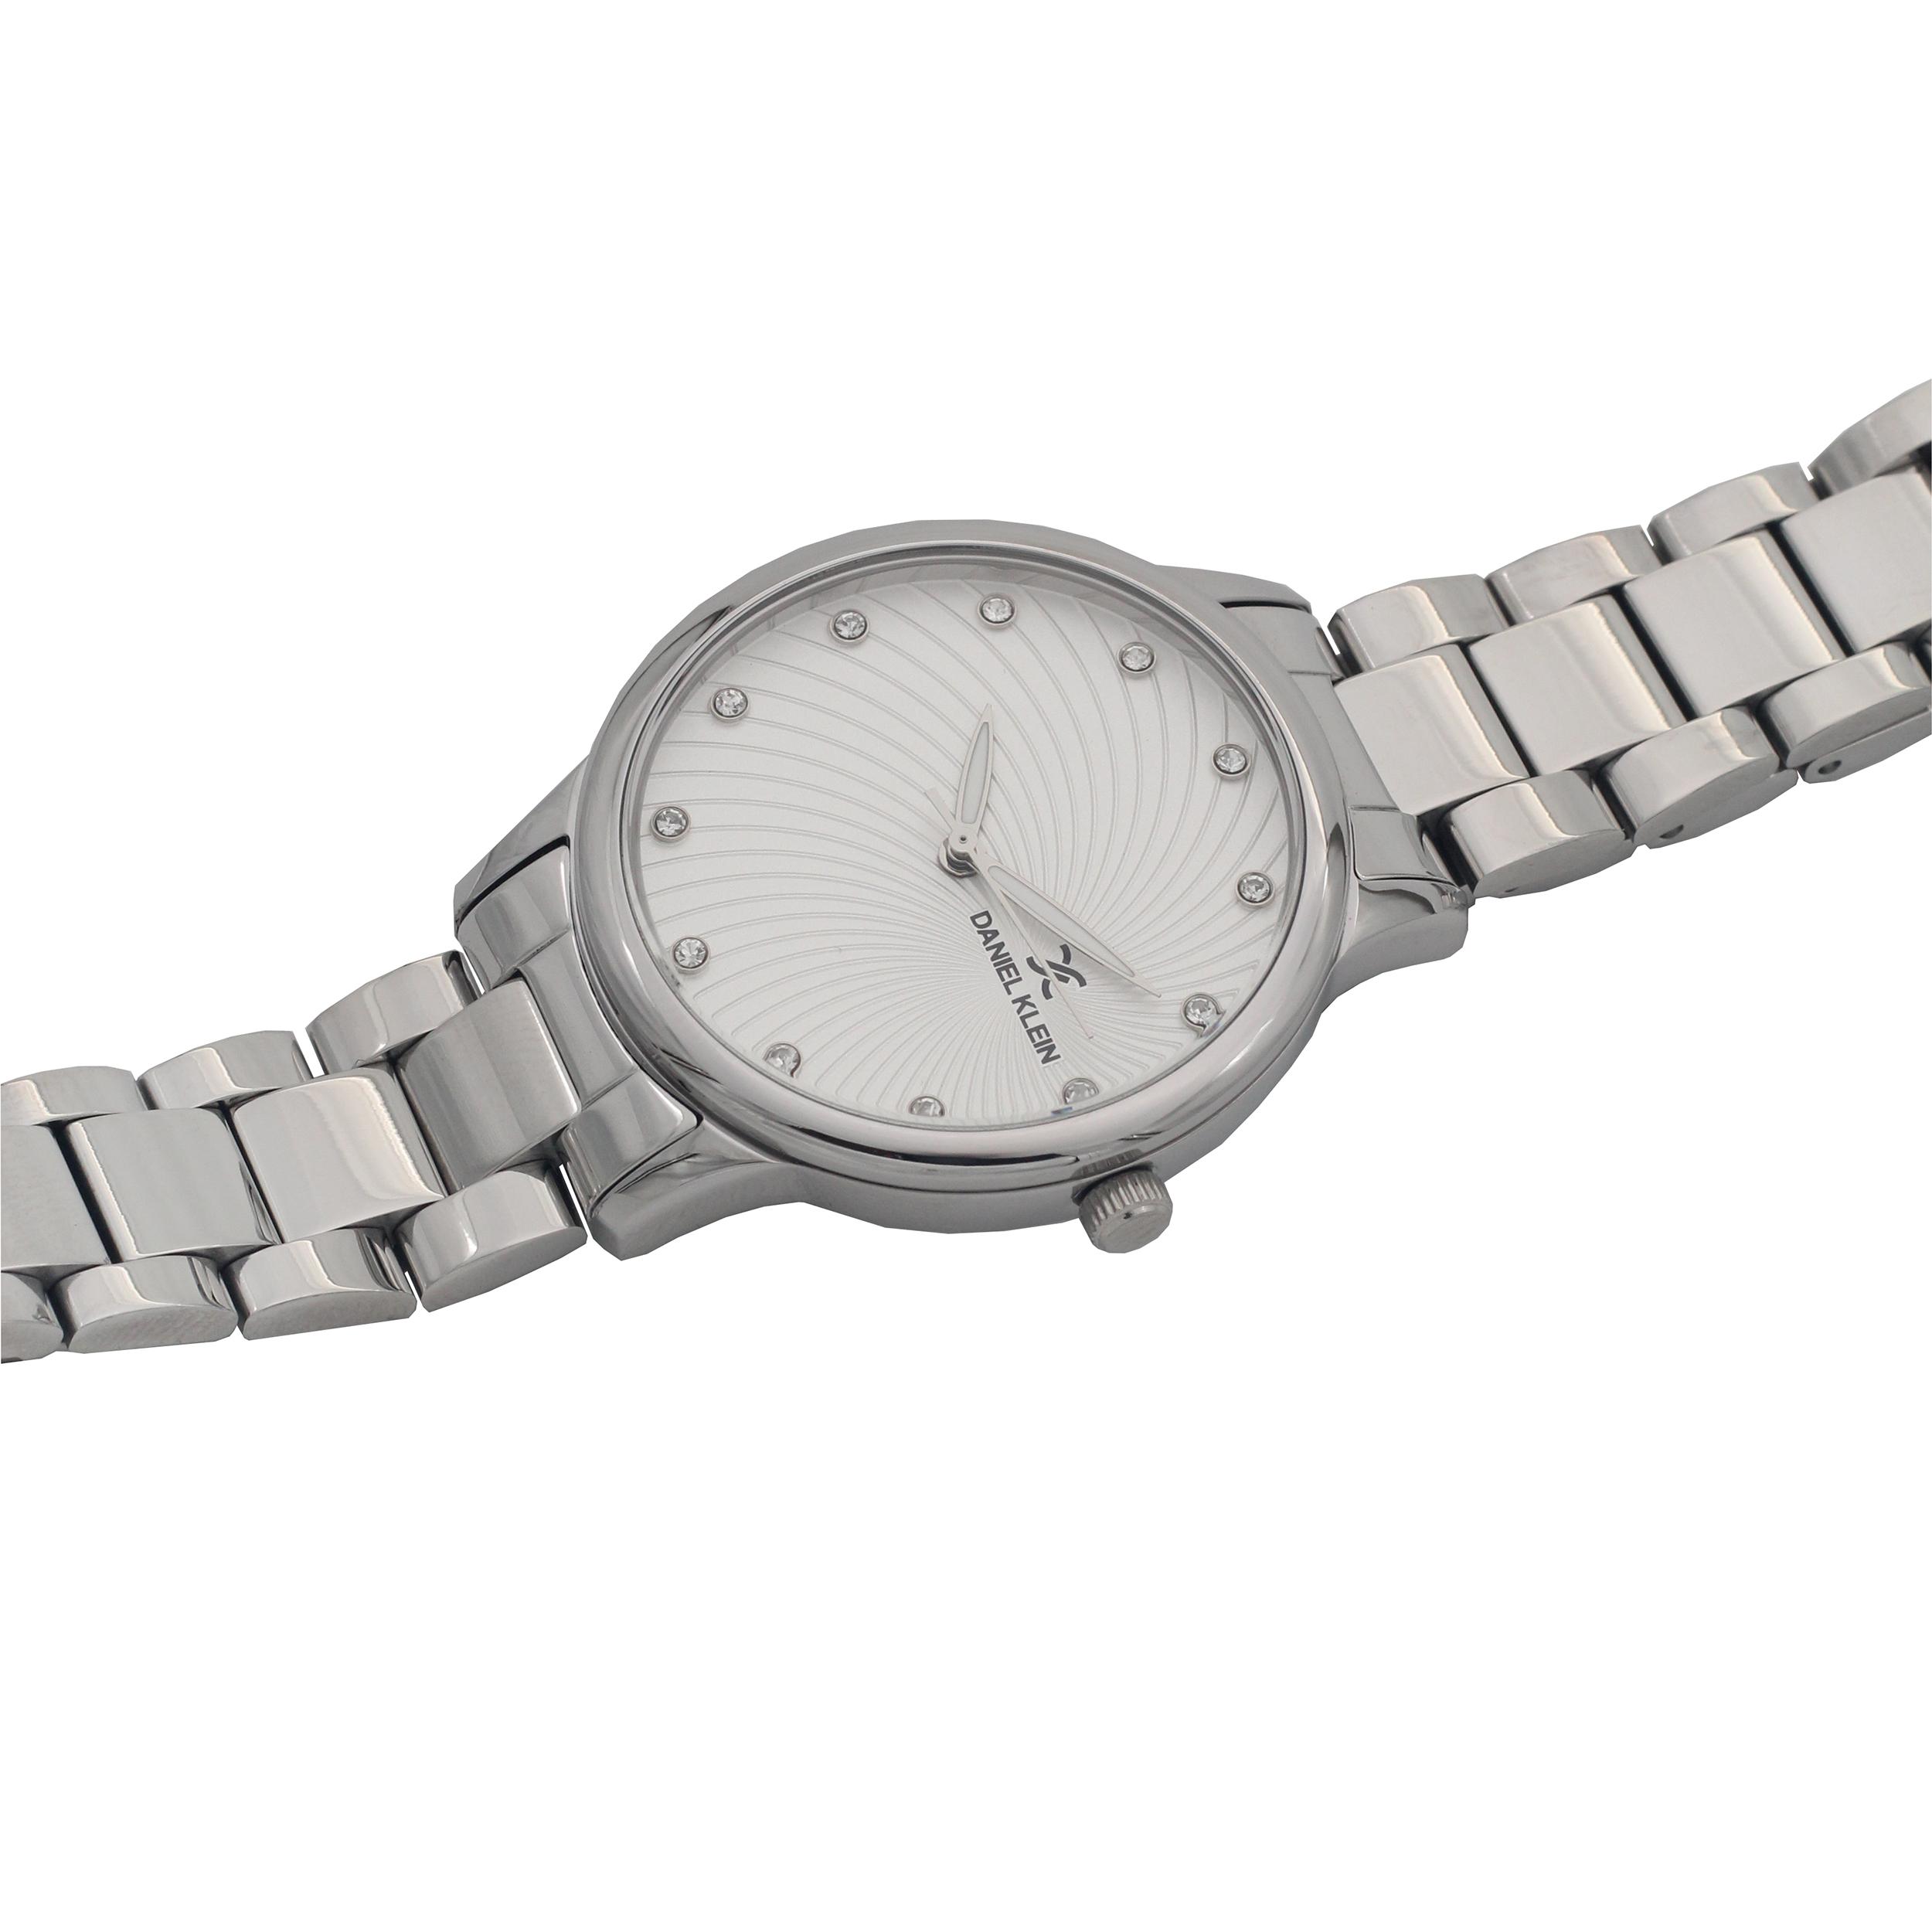 خرید و قیمت                      ساعت مچی  زنانه دنیل کلین مدل DK12357-1